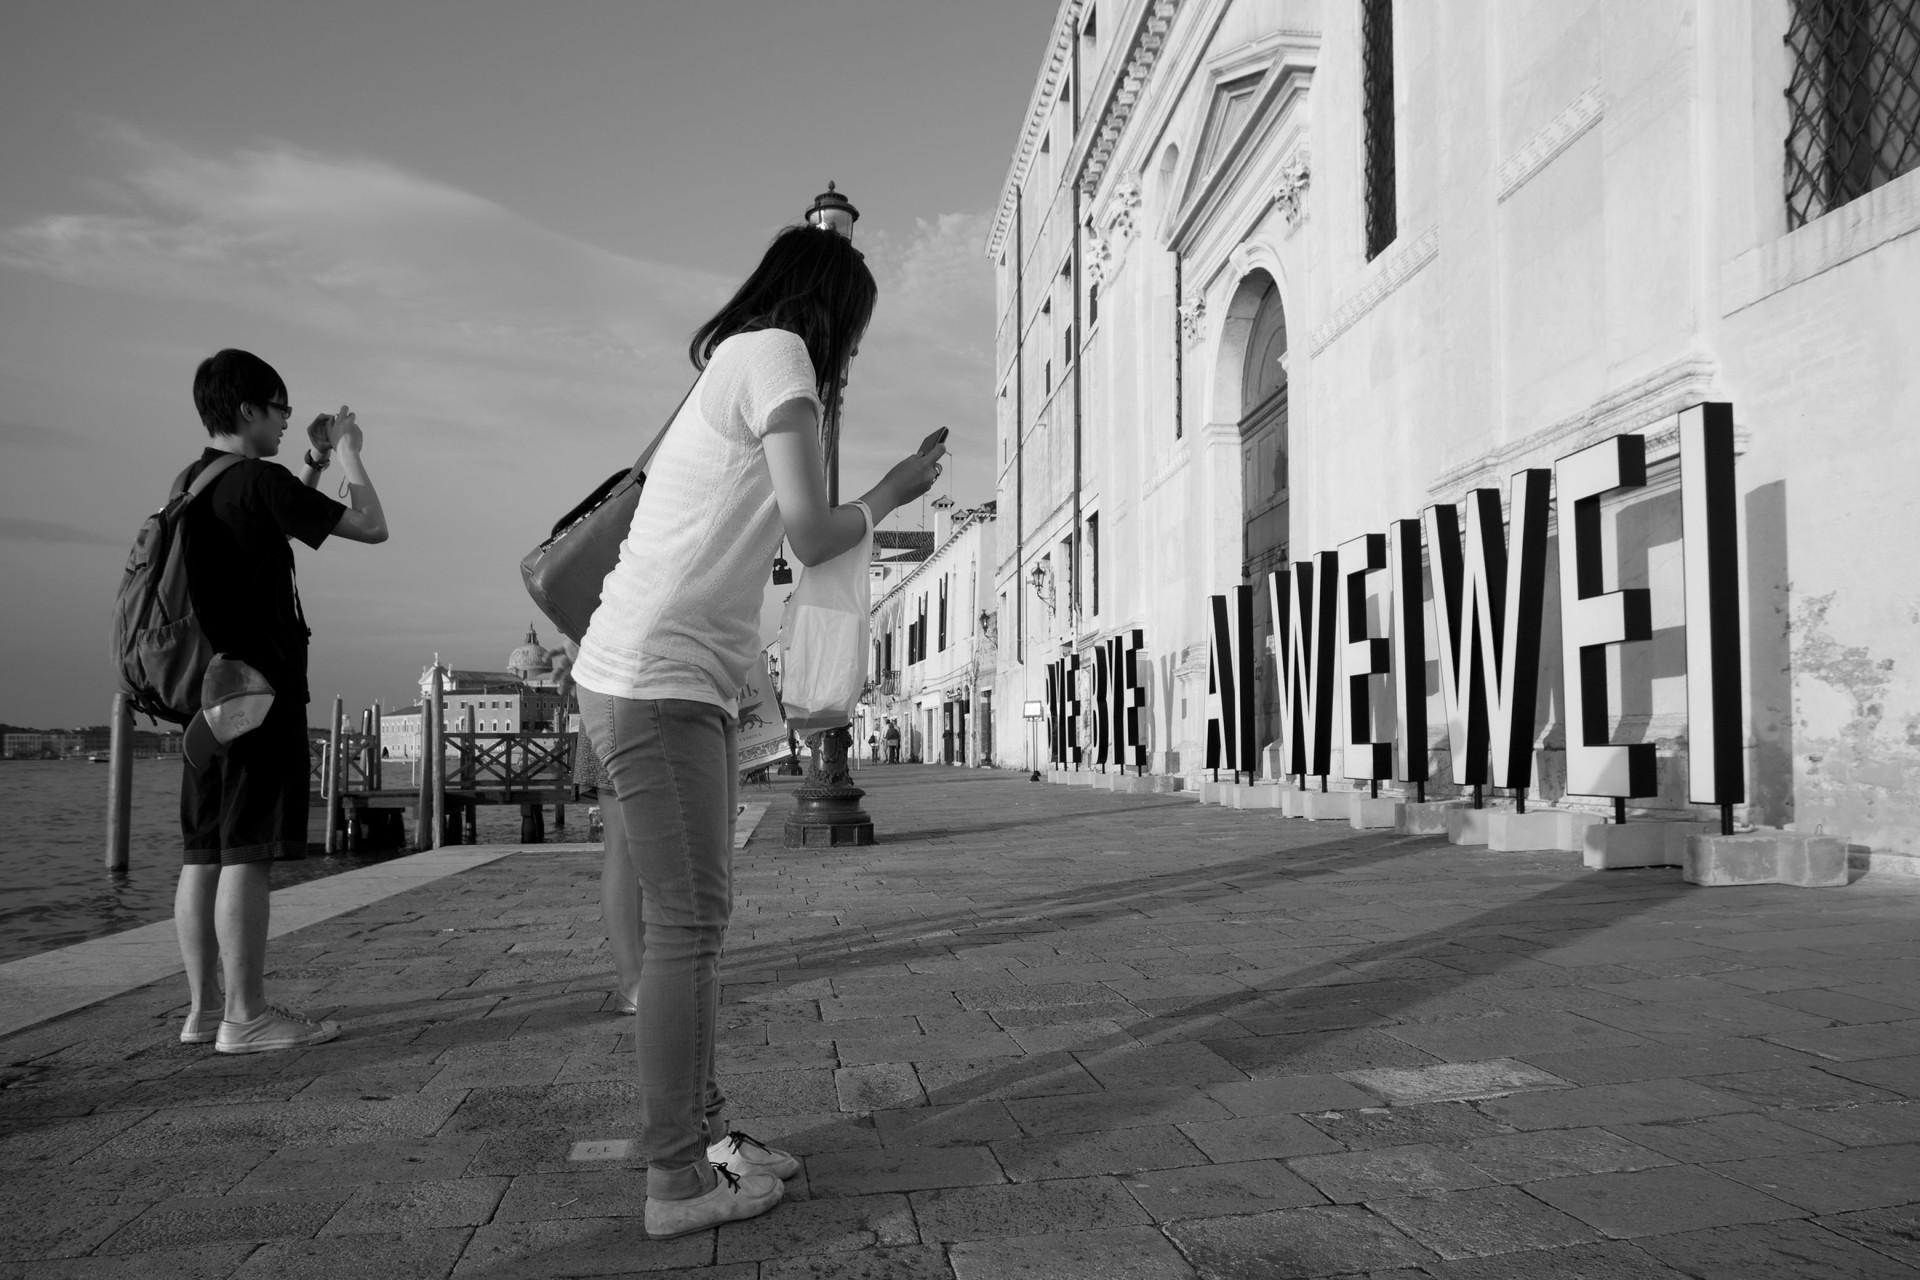 Byebye Ai Weiwei installazione1